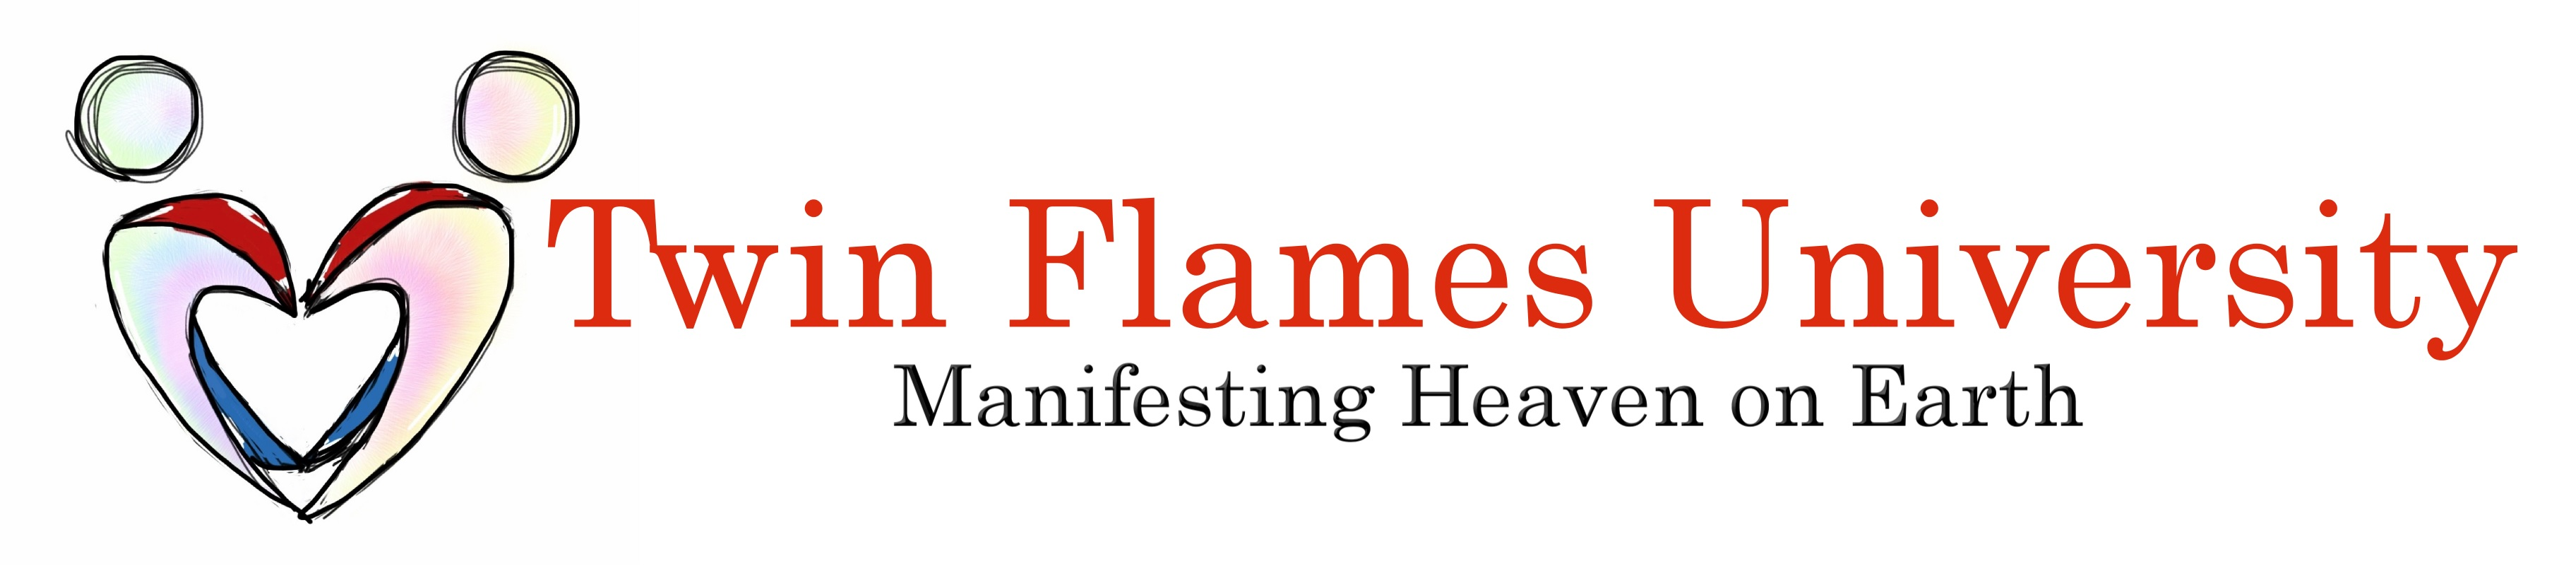 Twin Flames University